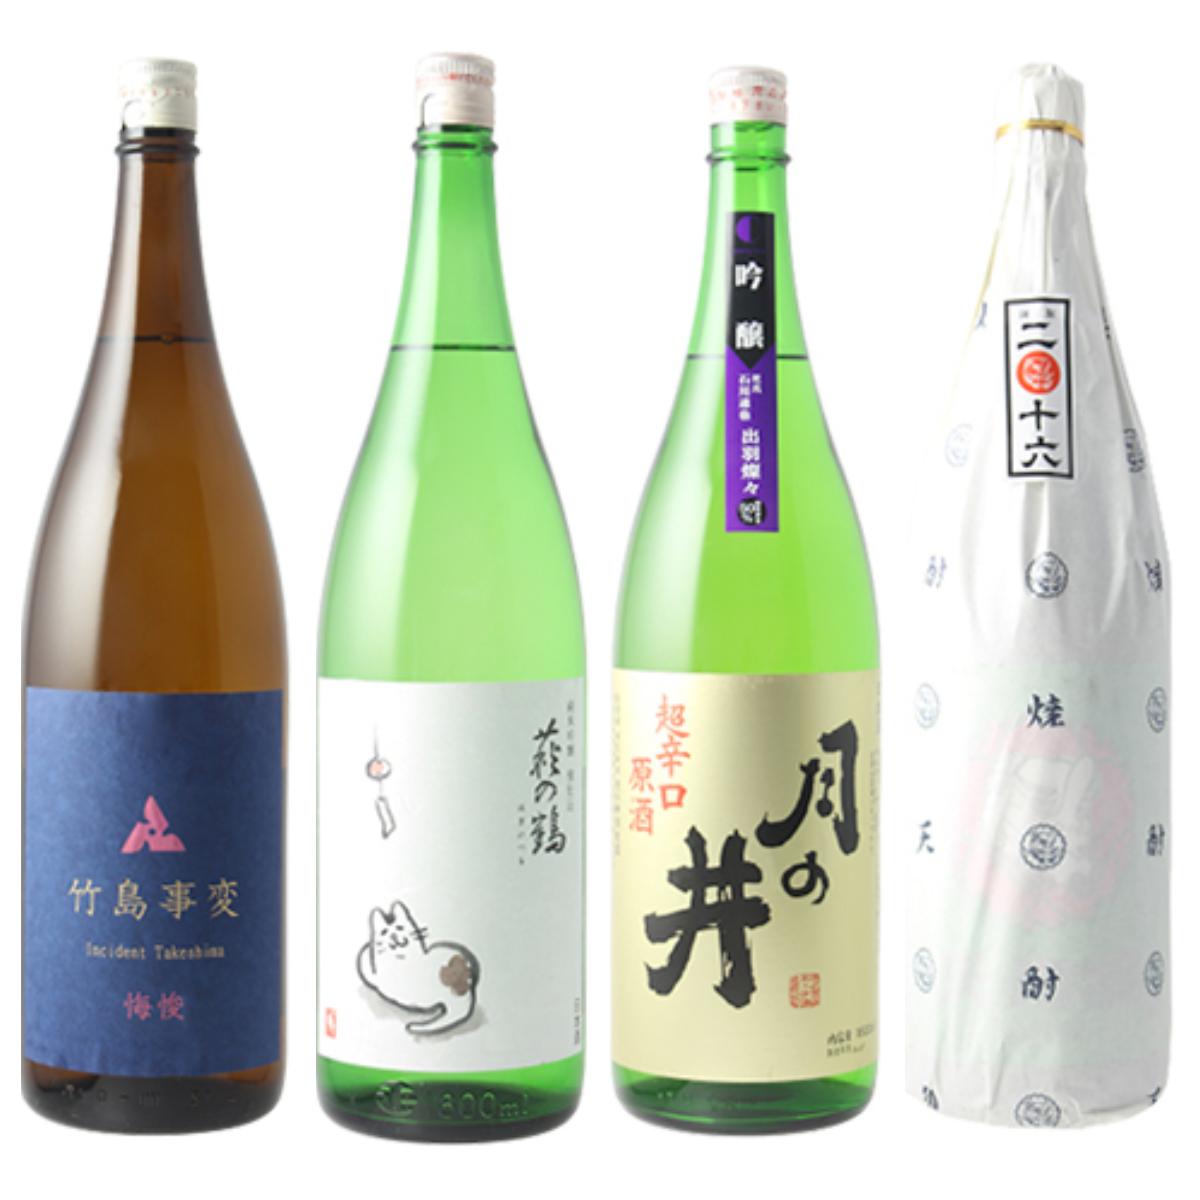 test ツイッターメディア - 【新入荷情報!】7月27日入荷分です。 本日は限定日本酒、夏酒、焼酎、日本ワイン、そして「月の井」話題のお酒などが入荷です!! https://t.co/u7T7dZWF14 https://t.co/StvS9jdDoX